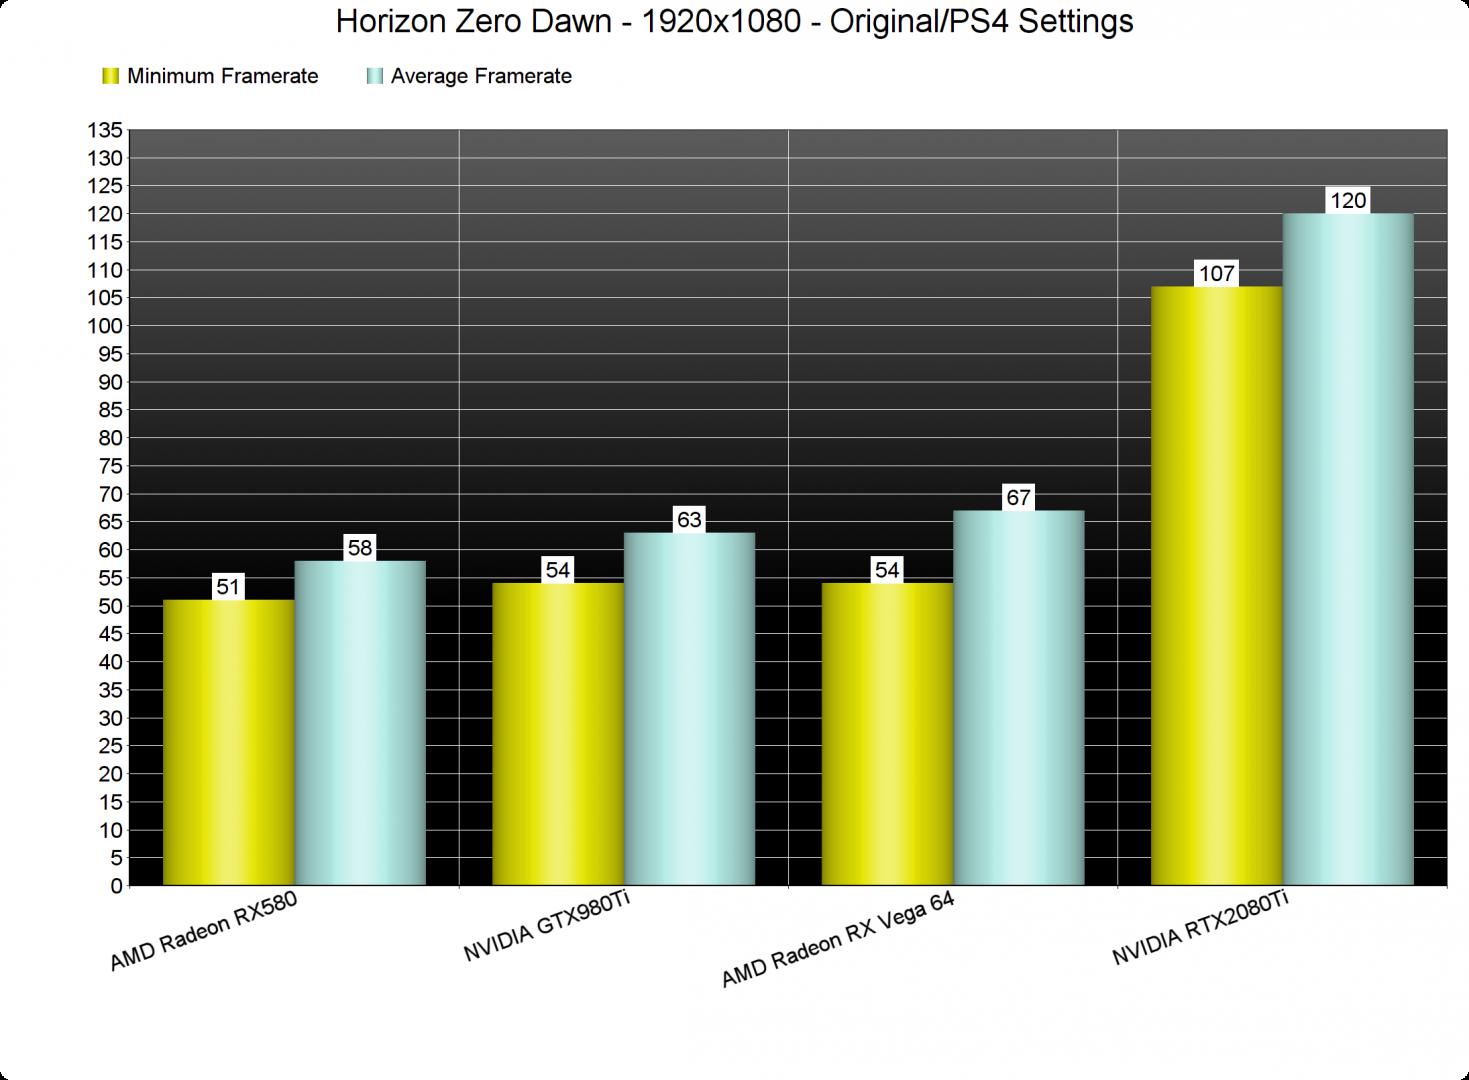 Horizon Zero Dawn GPU benchmarks Original-PS4 settings